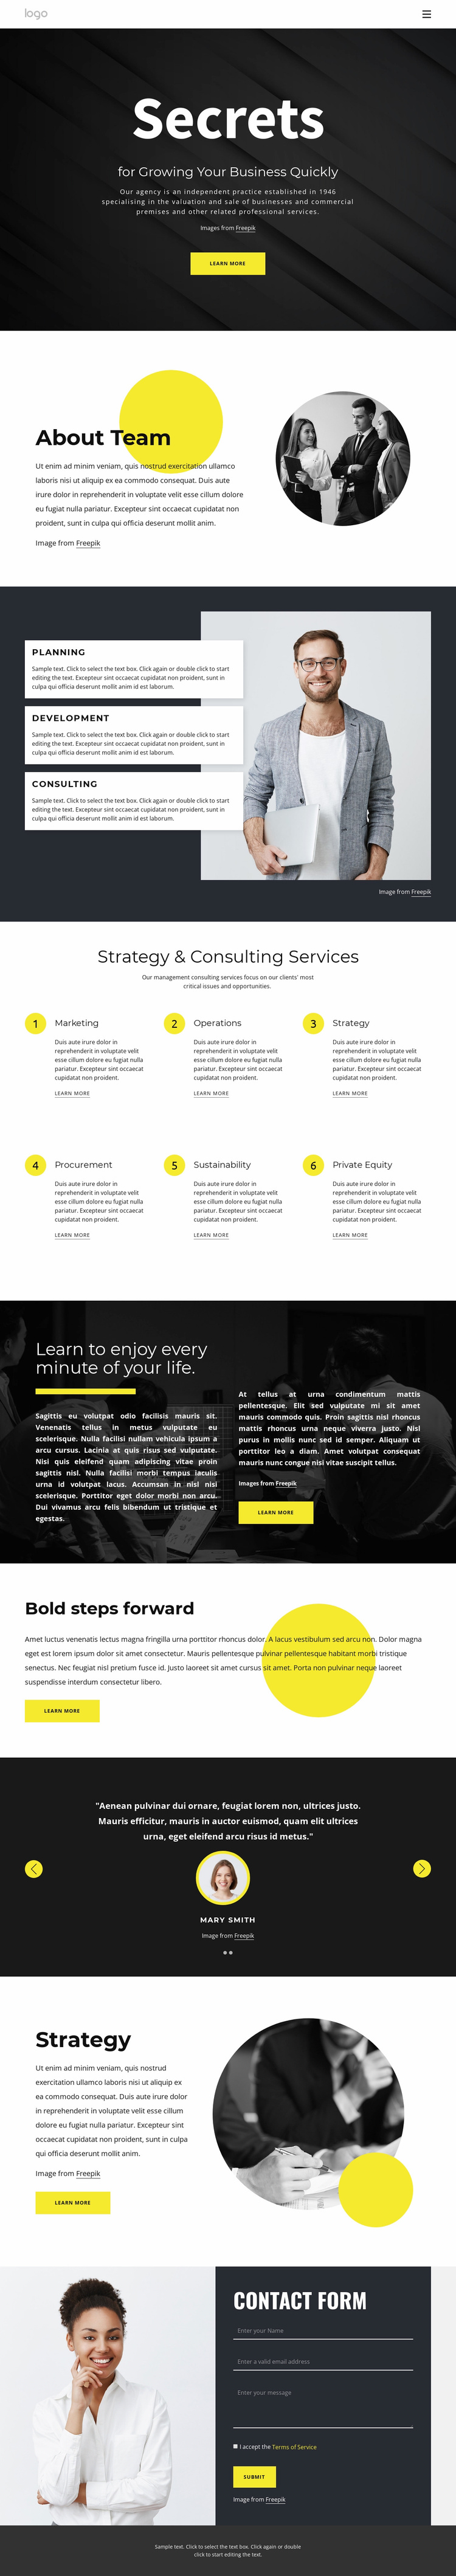 Secrets of growing business Website Template